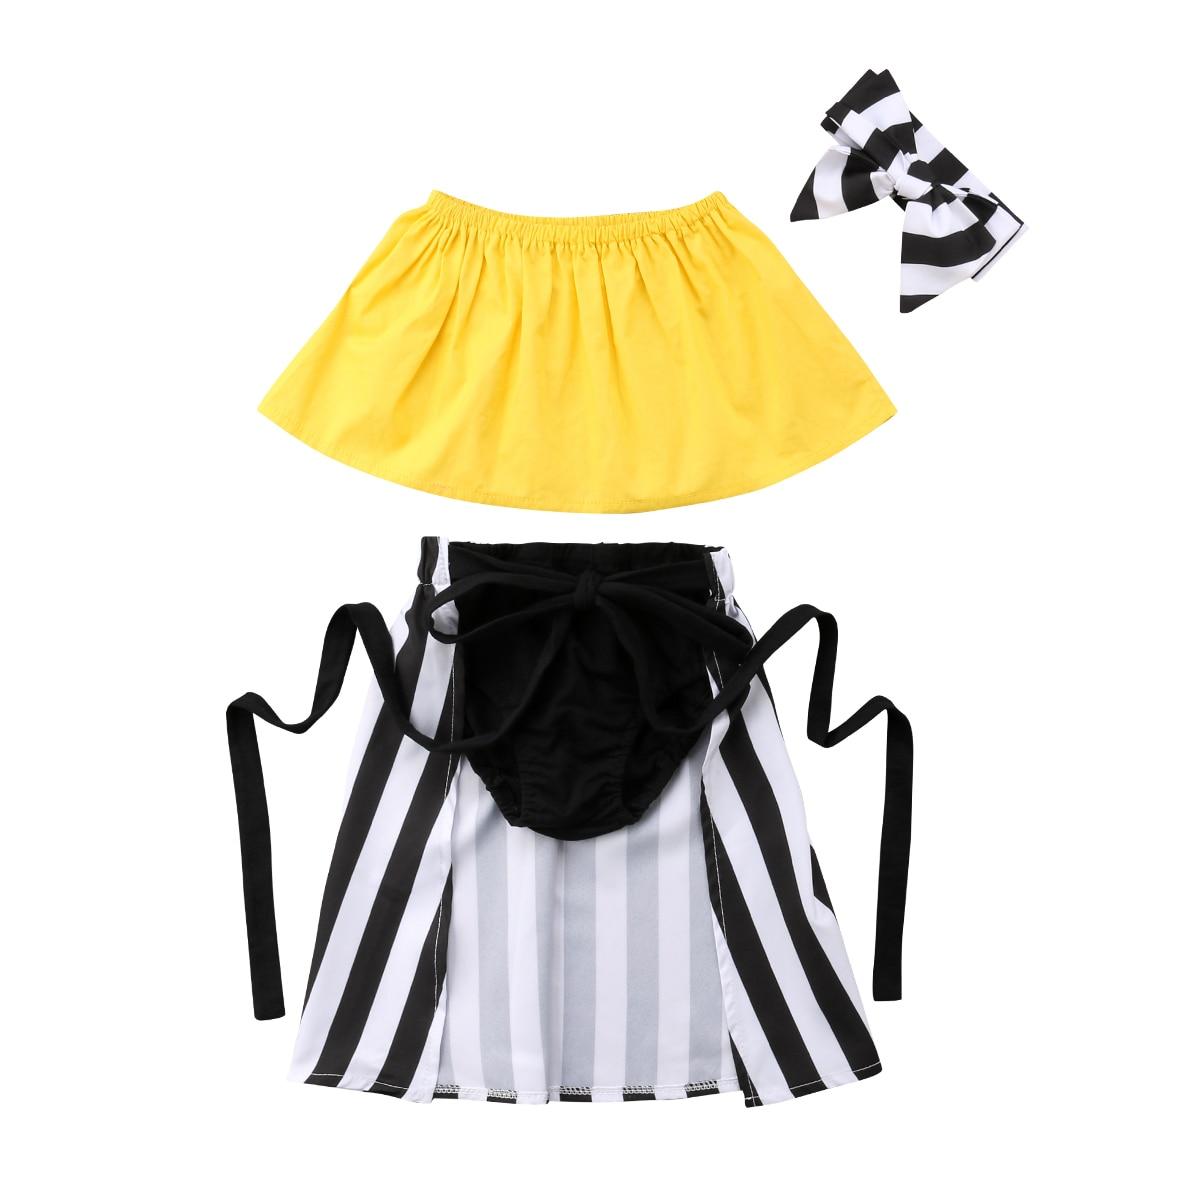 USA Toddler Baby Girl Clothes Outfits Set Dress Tops Shorts Pants Headband Dress